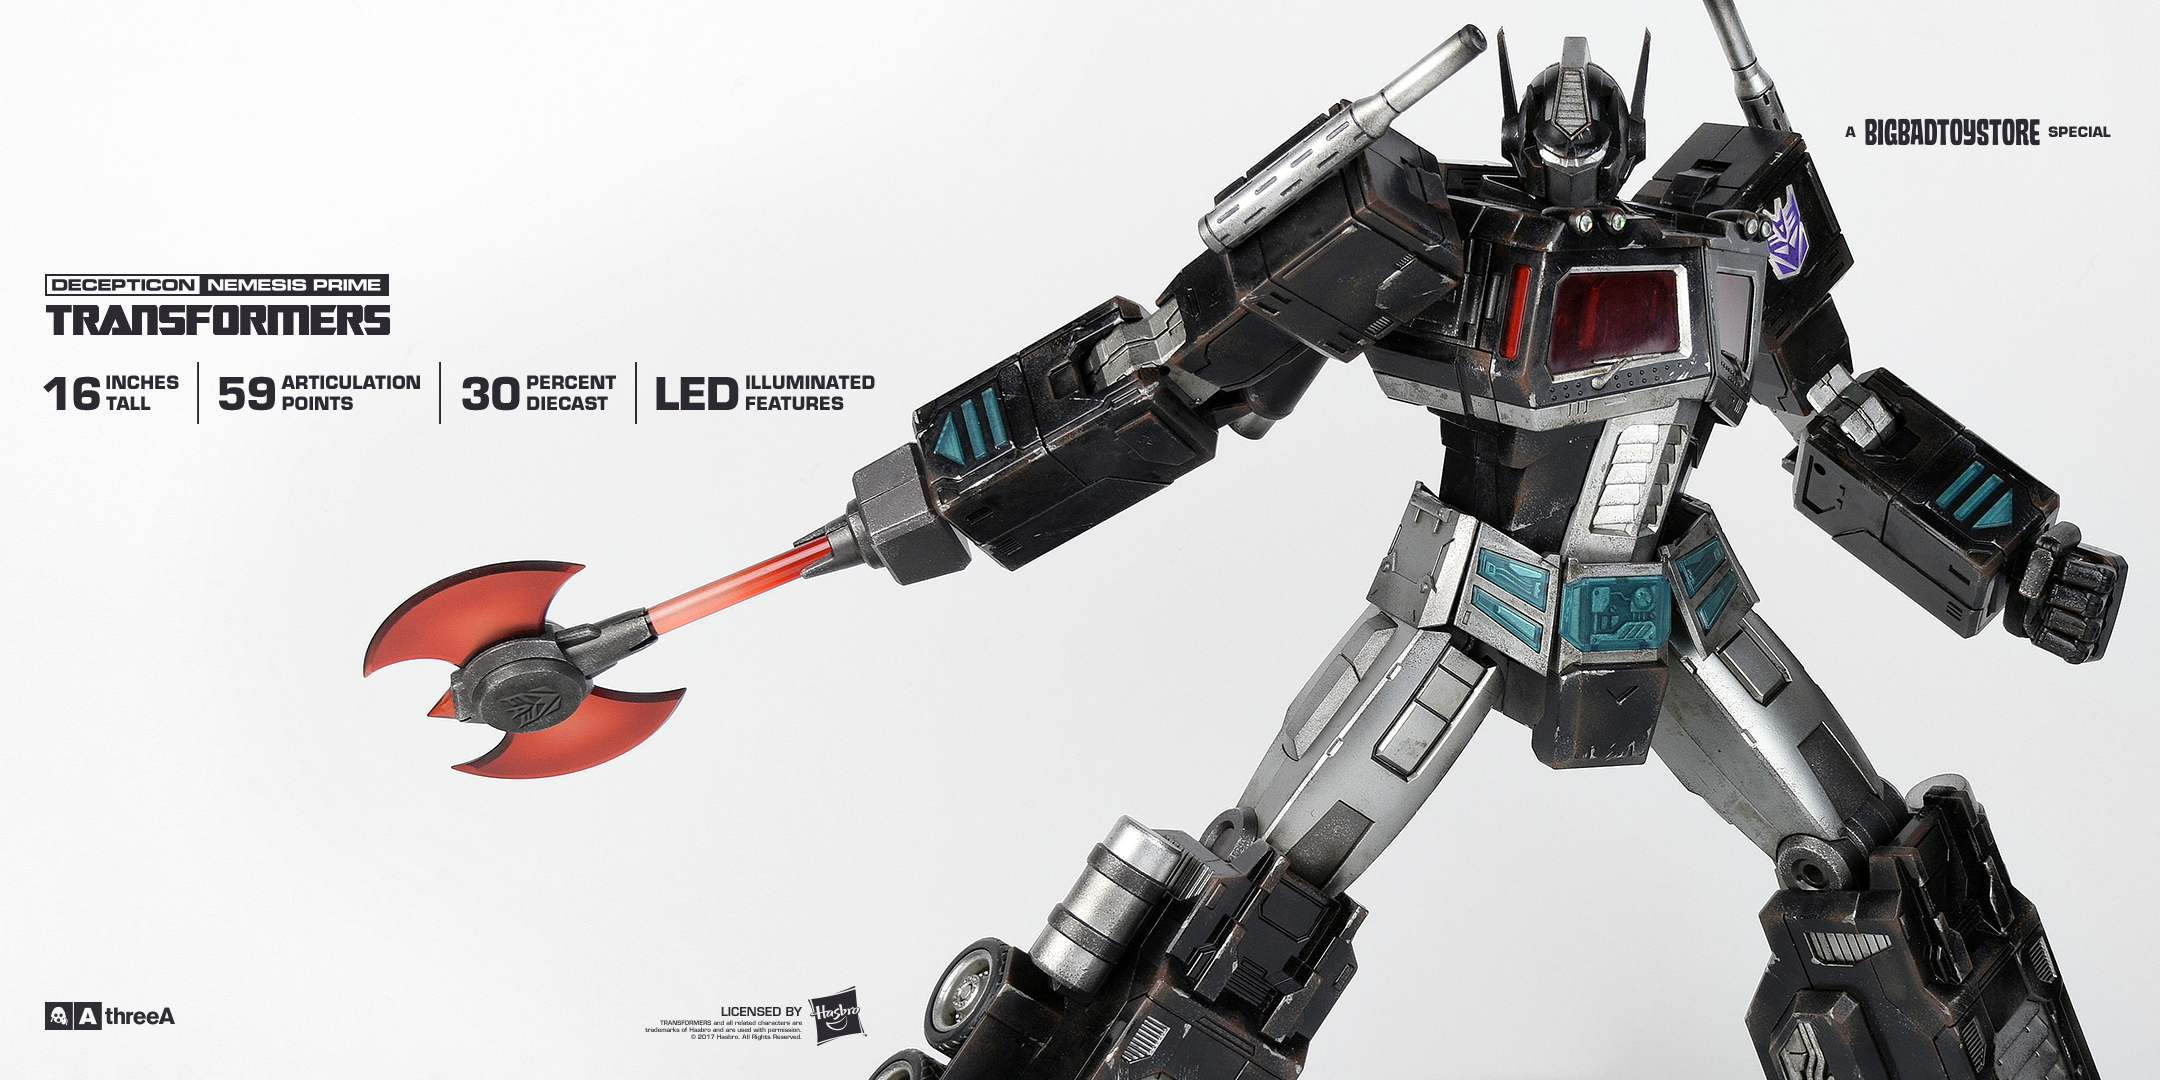 3A_Hasbro_Transformers_NemesisPrime_Landscape_v002.jpg